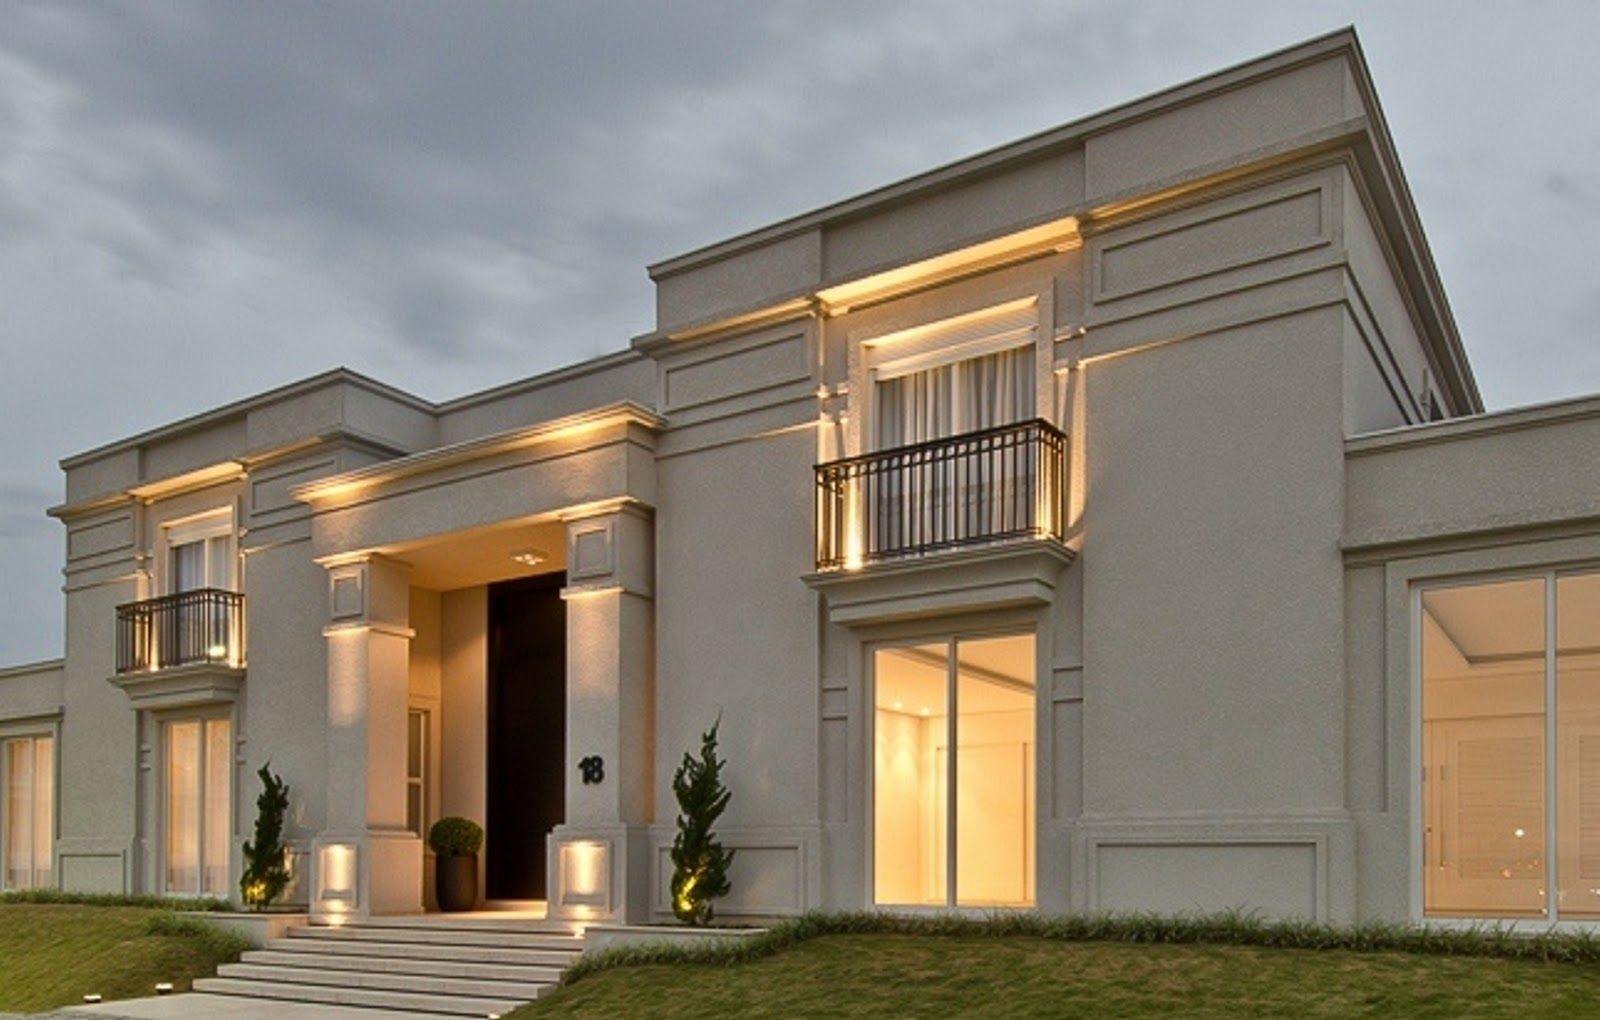 Fachadas de casas com estilo neocl ssico veja modelos for Modelos de casas grandes